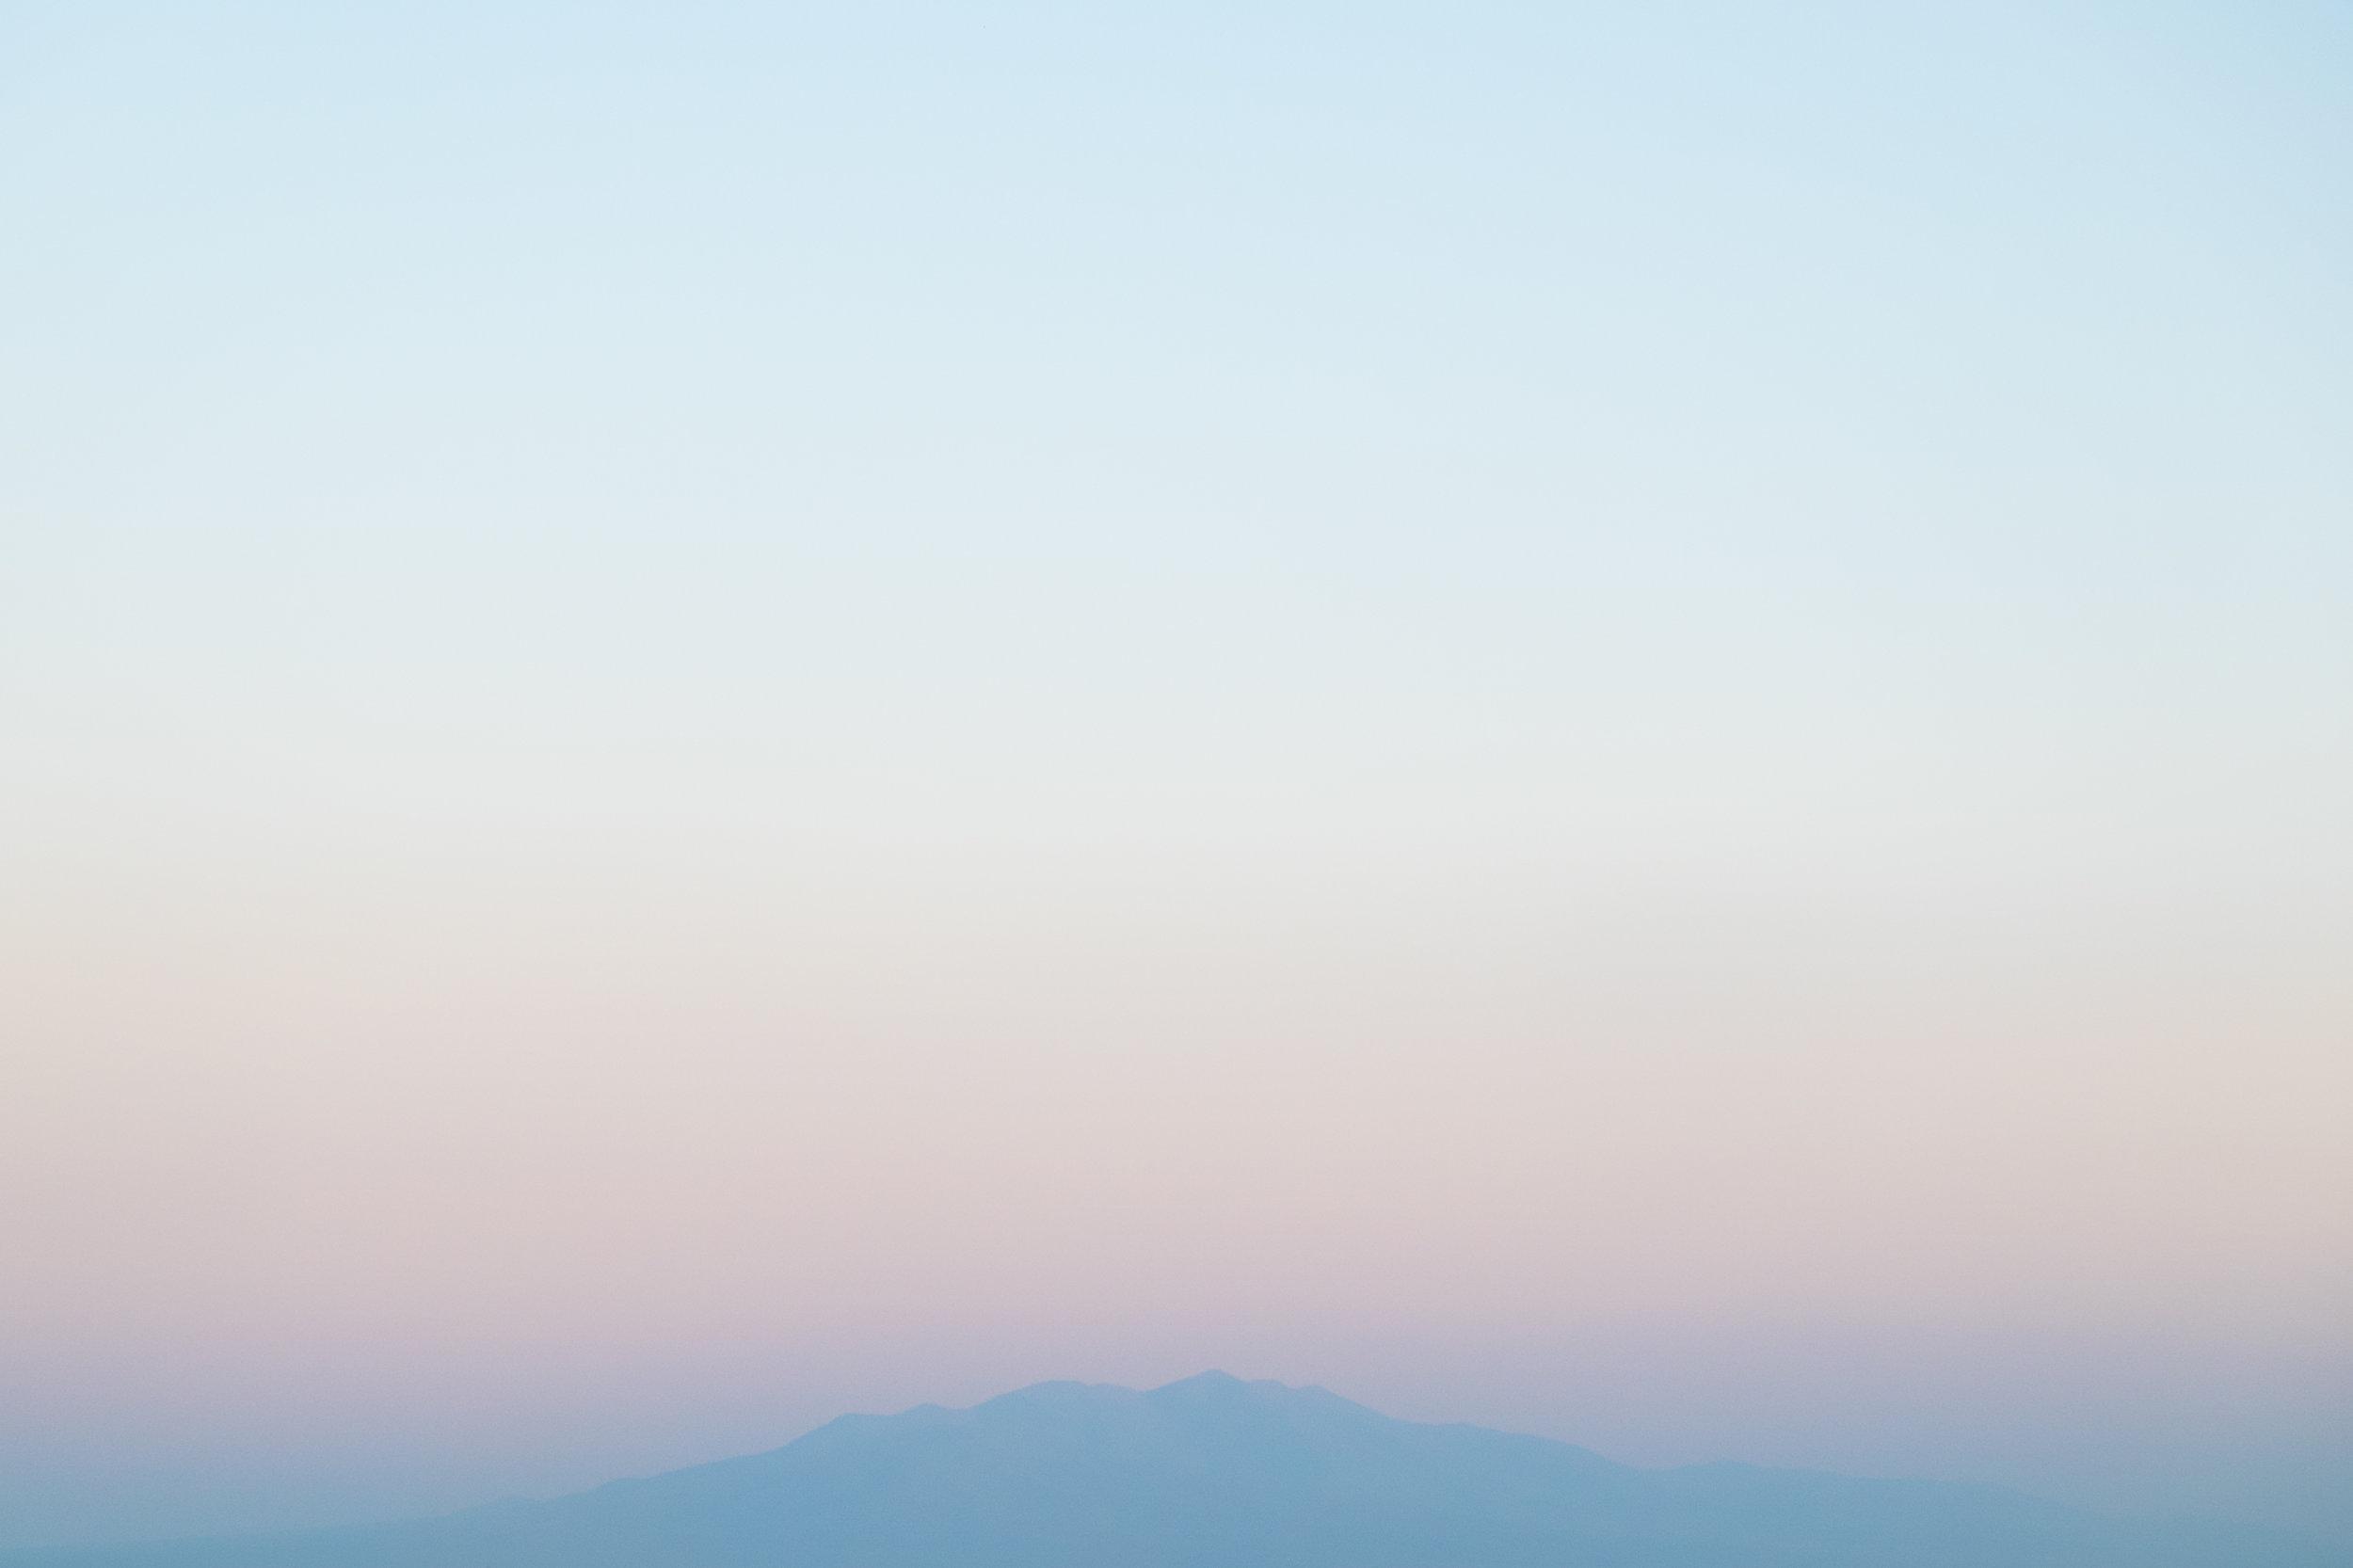 West_coast-4953.jpg